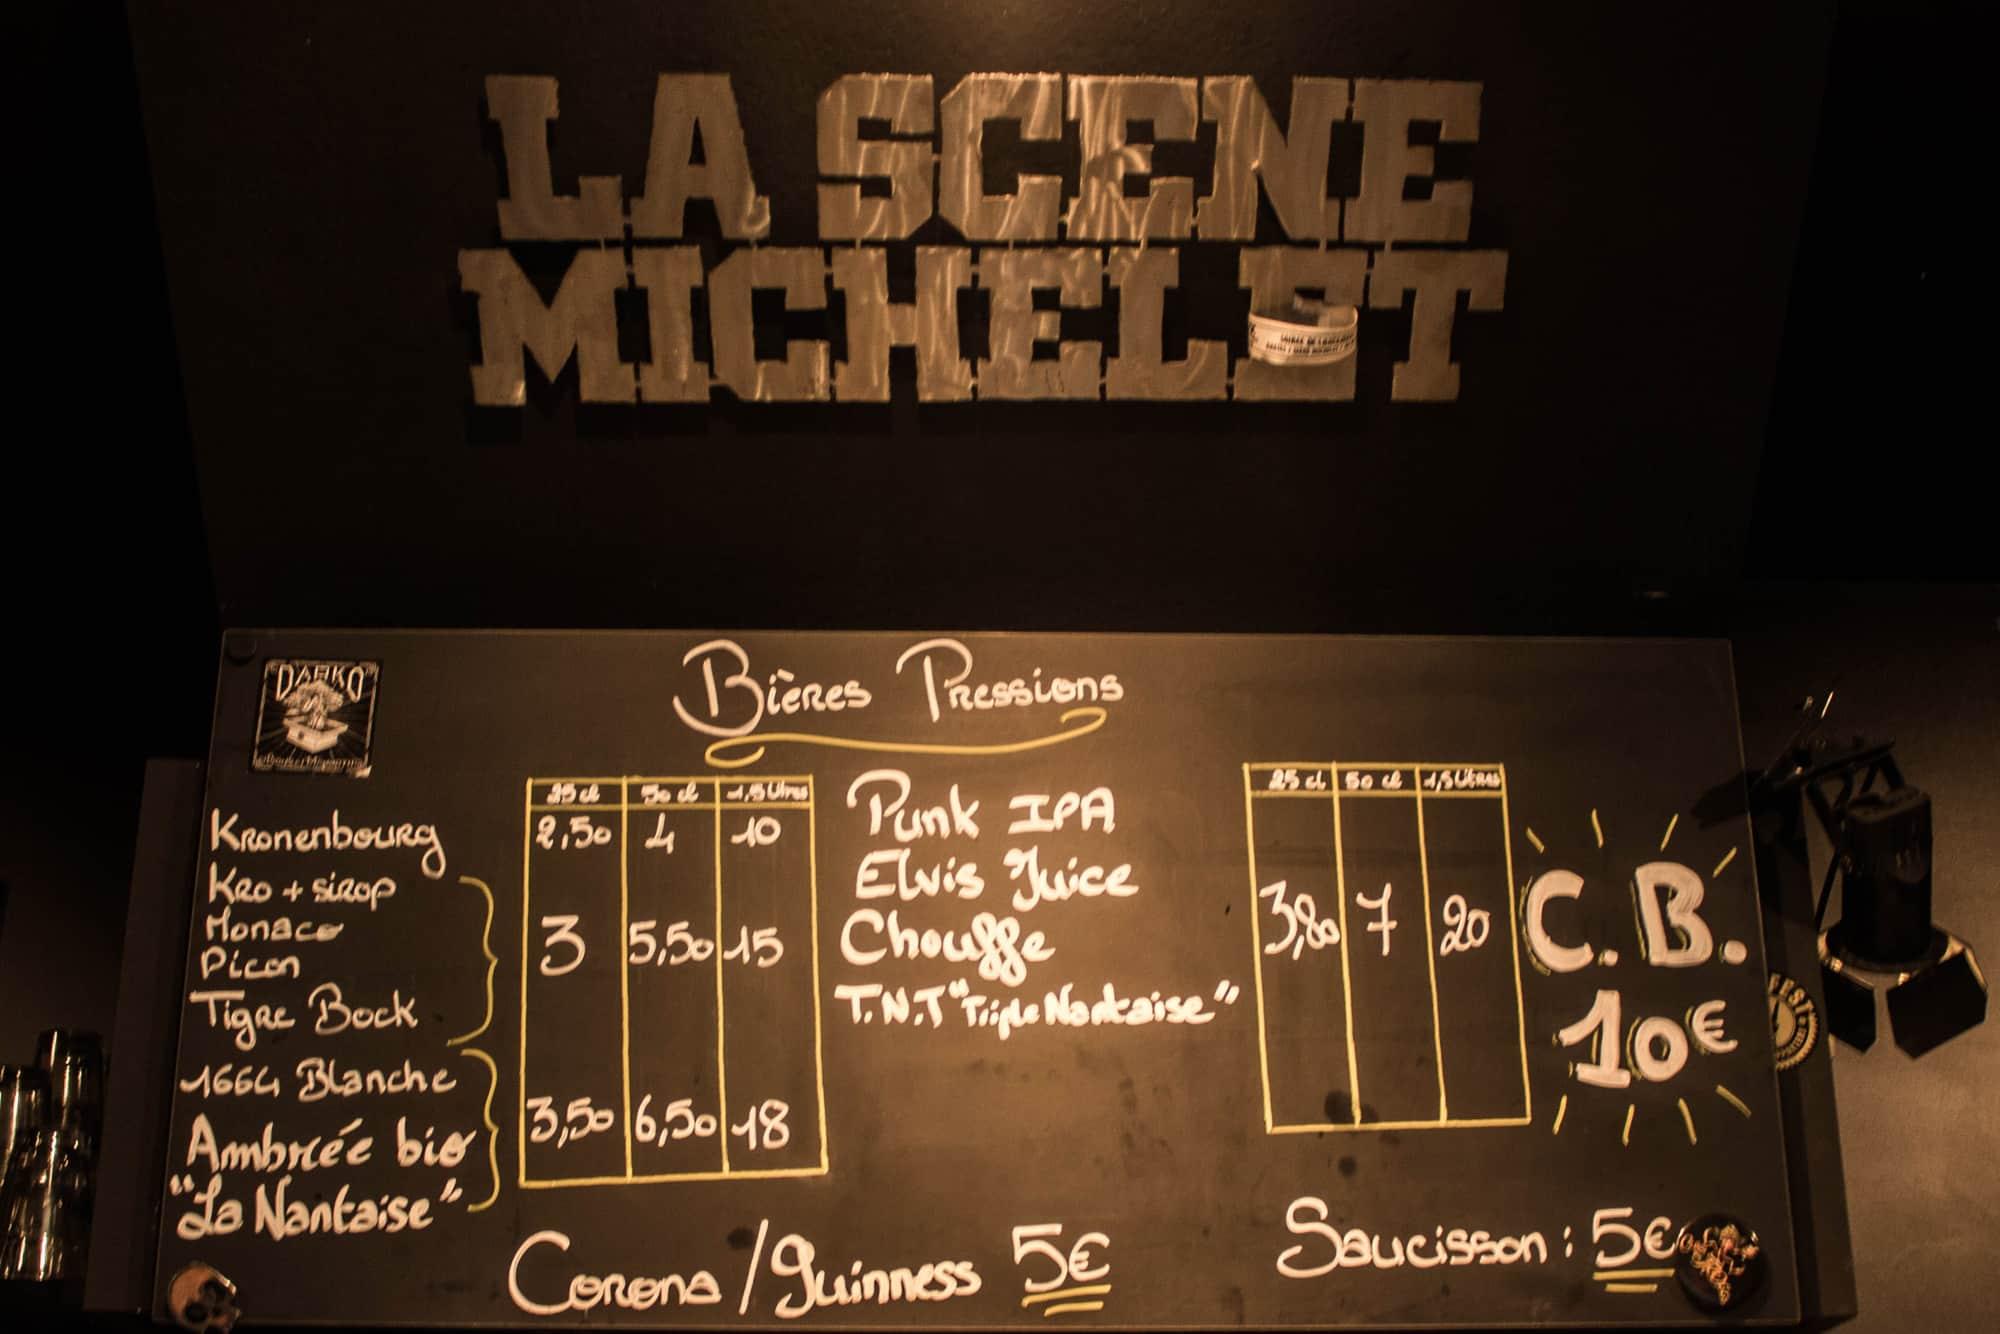 Carte-Michelet